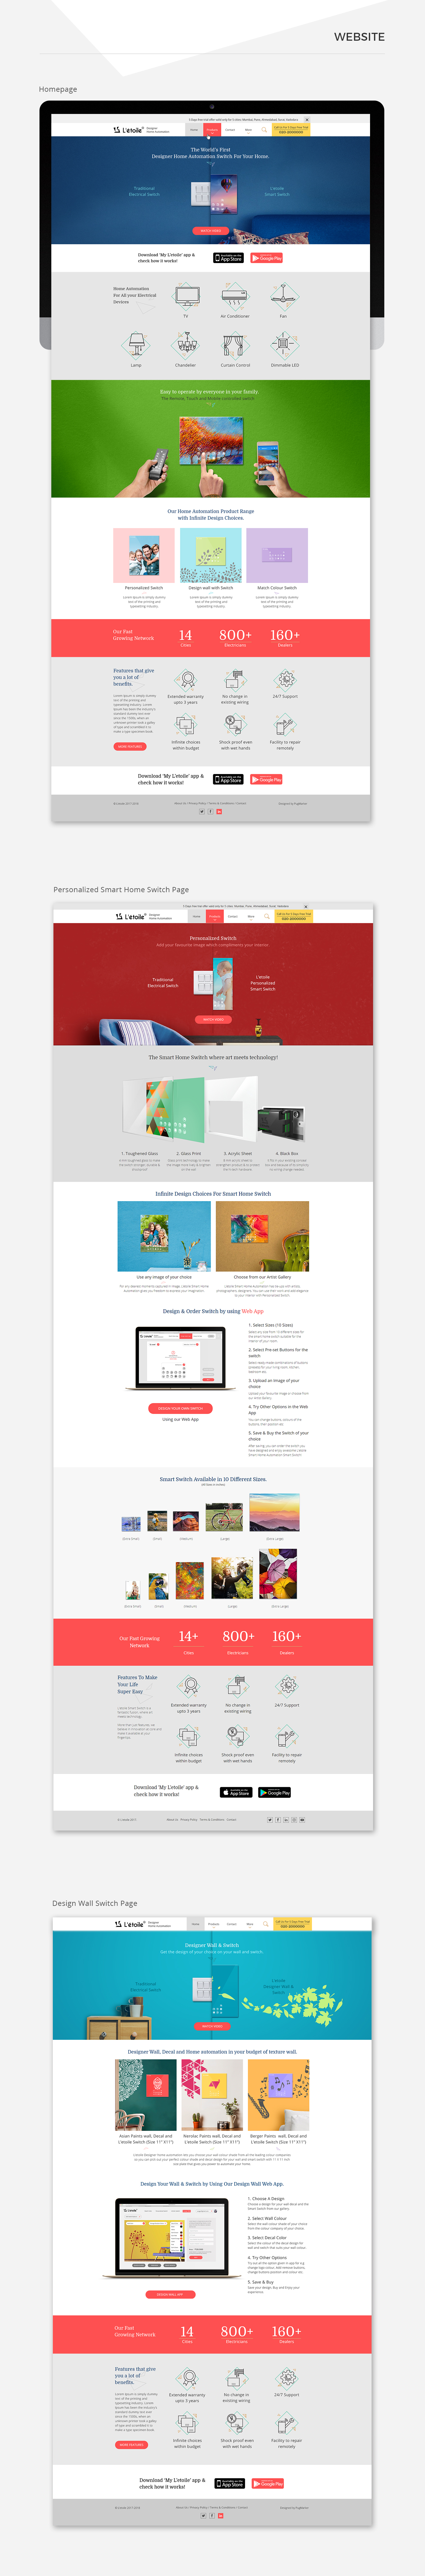 Letoile website design